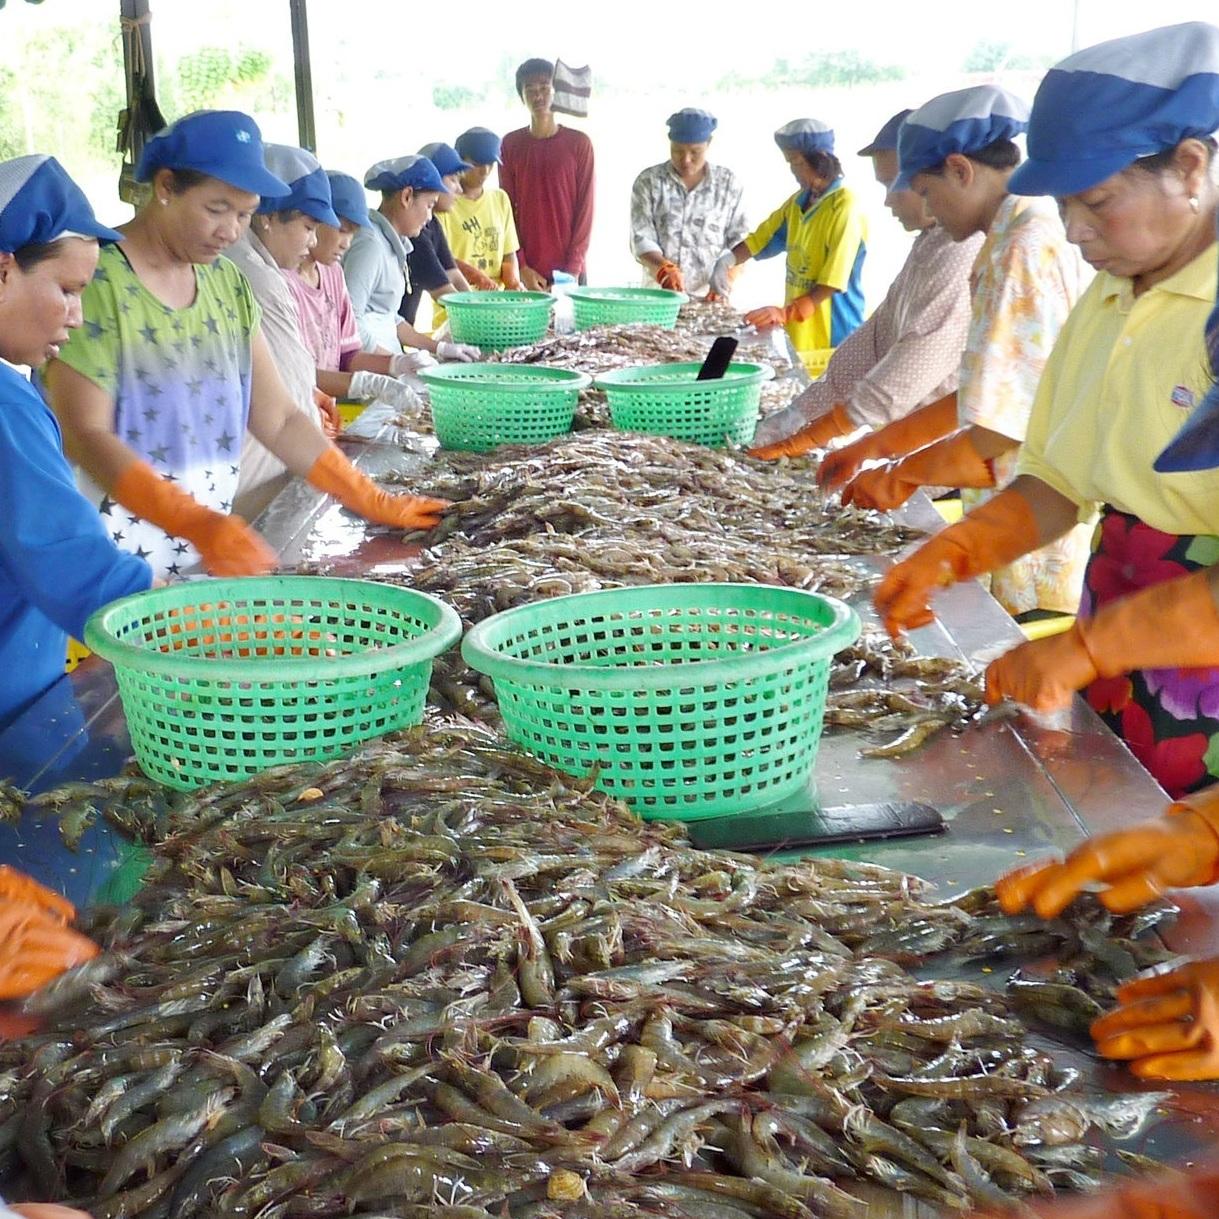 Asian_seafood_processors_sustainable_seafood.jpg